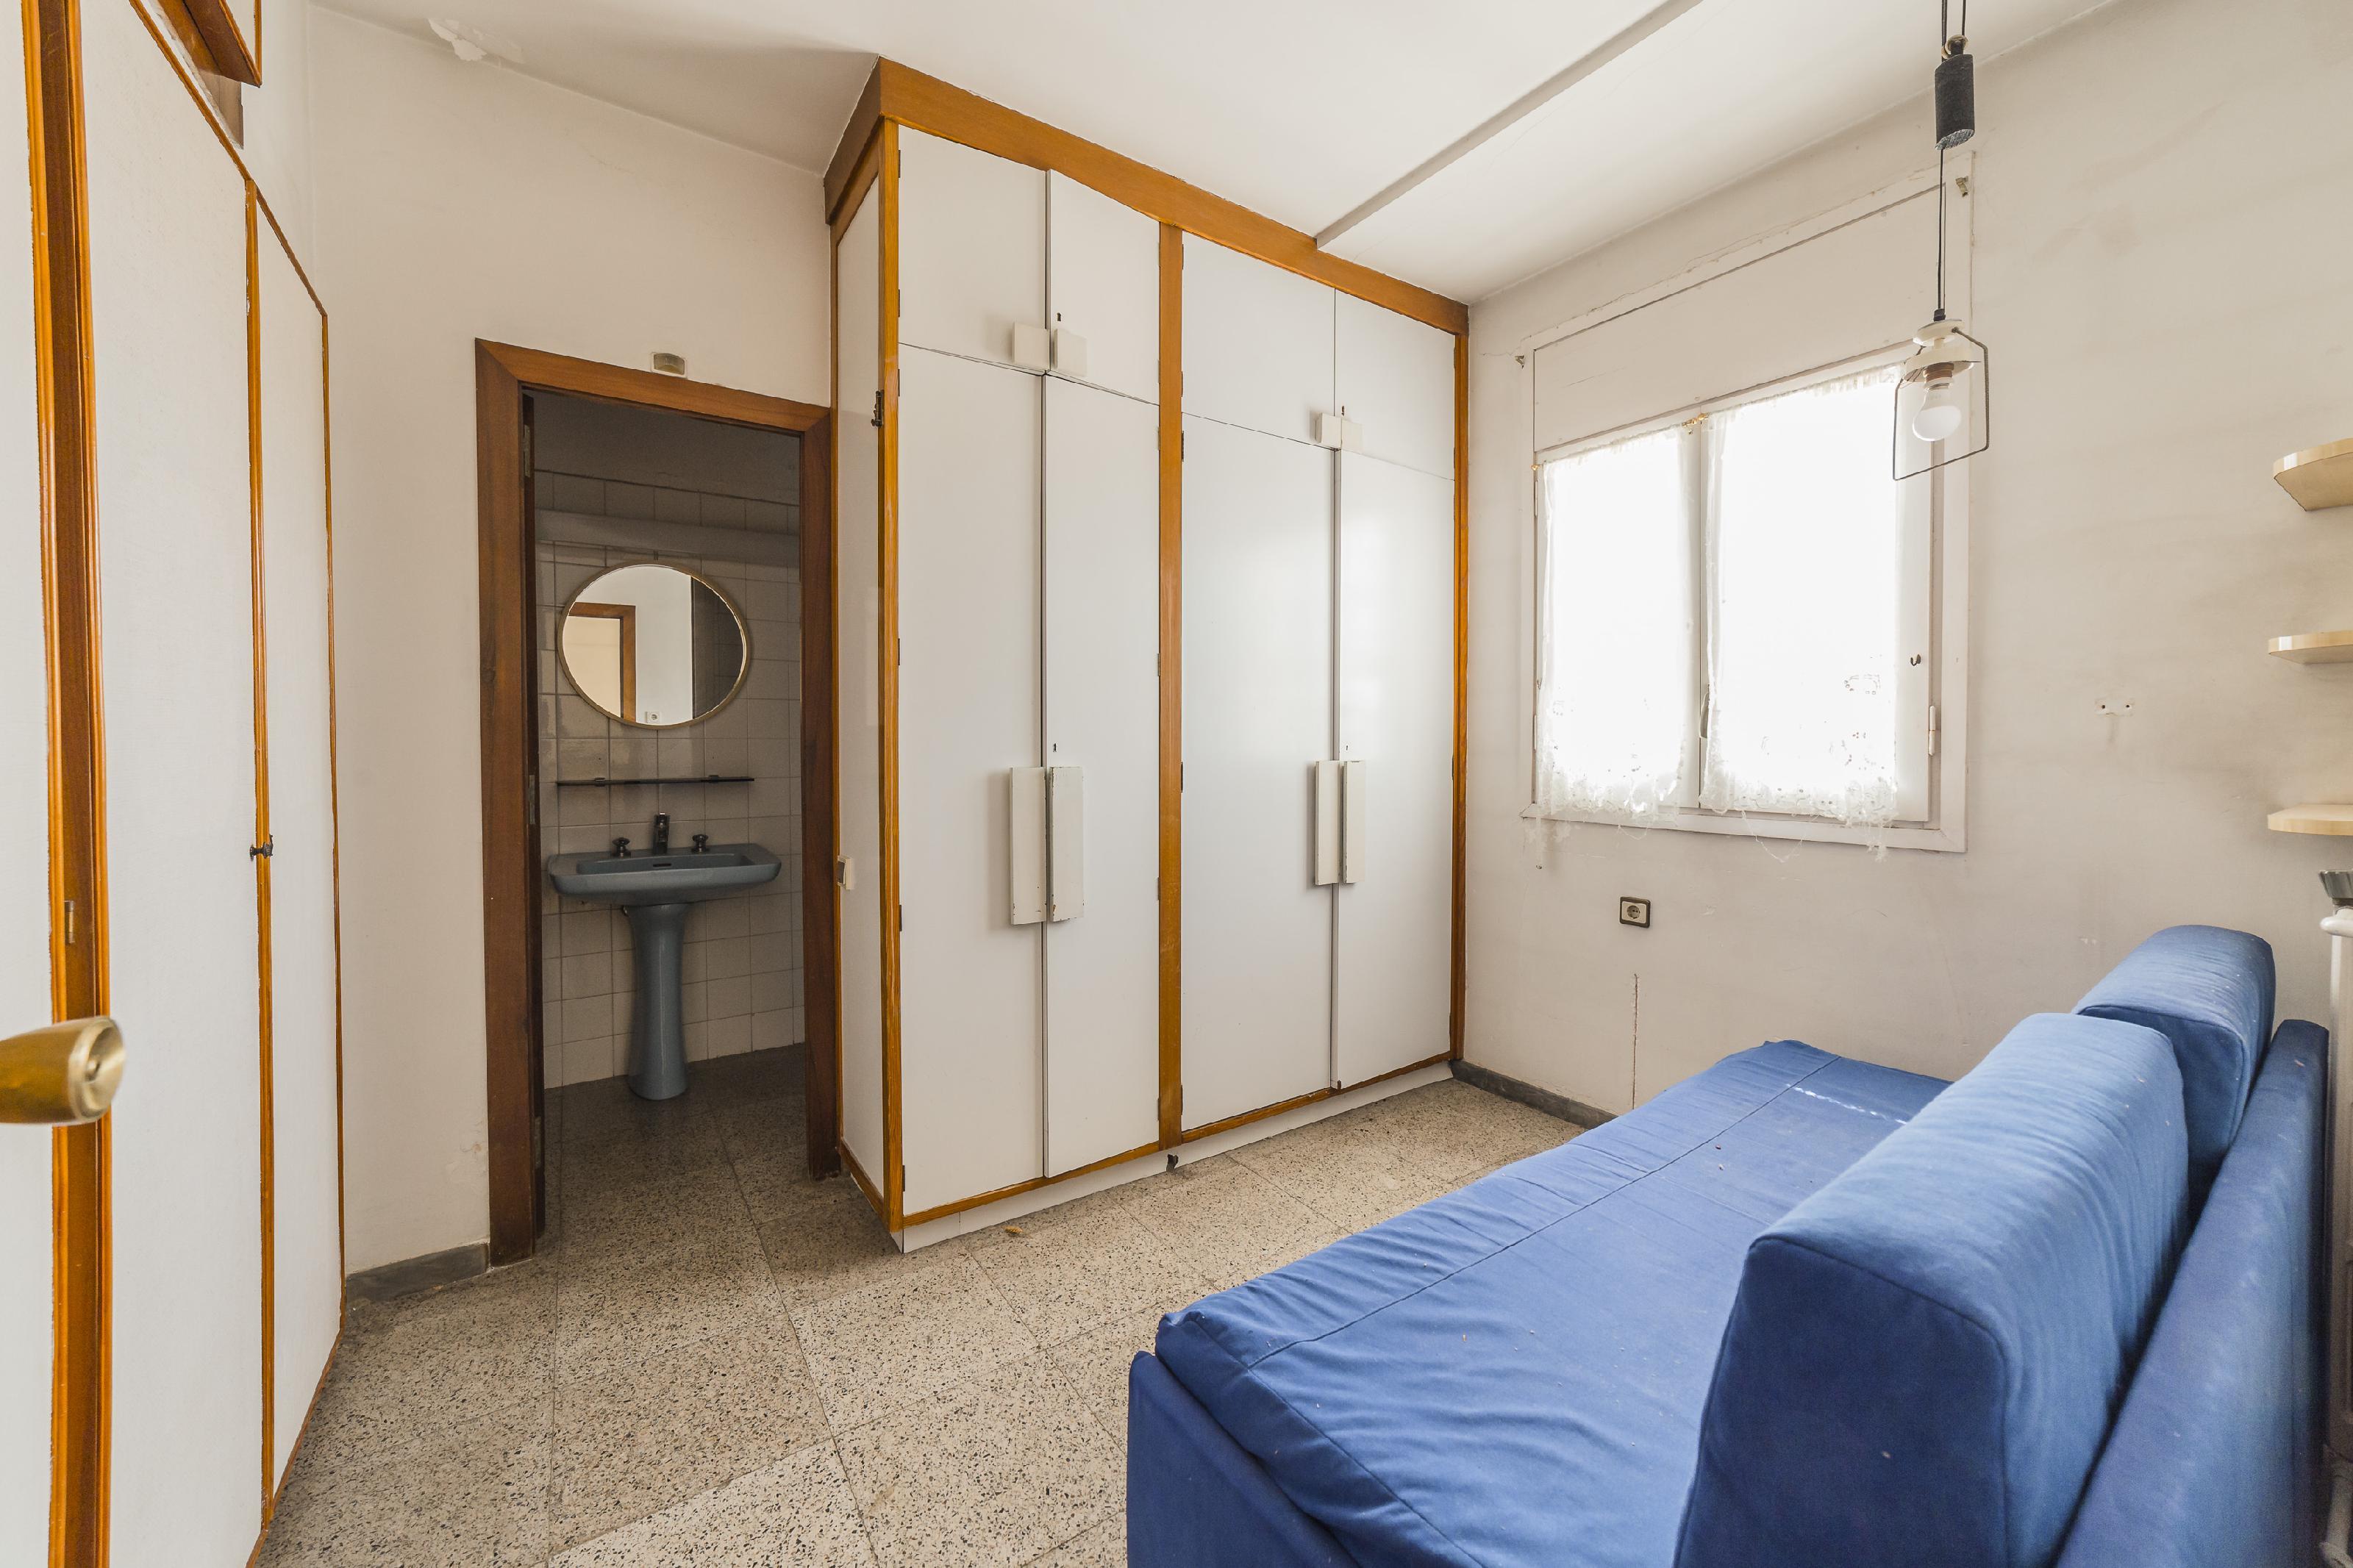 249314 Penthouse for sale in Sarrià-Sant Gervasi, Sant Gervasi-Galvany 25